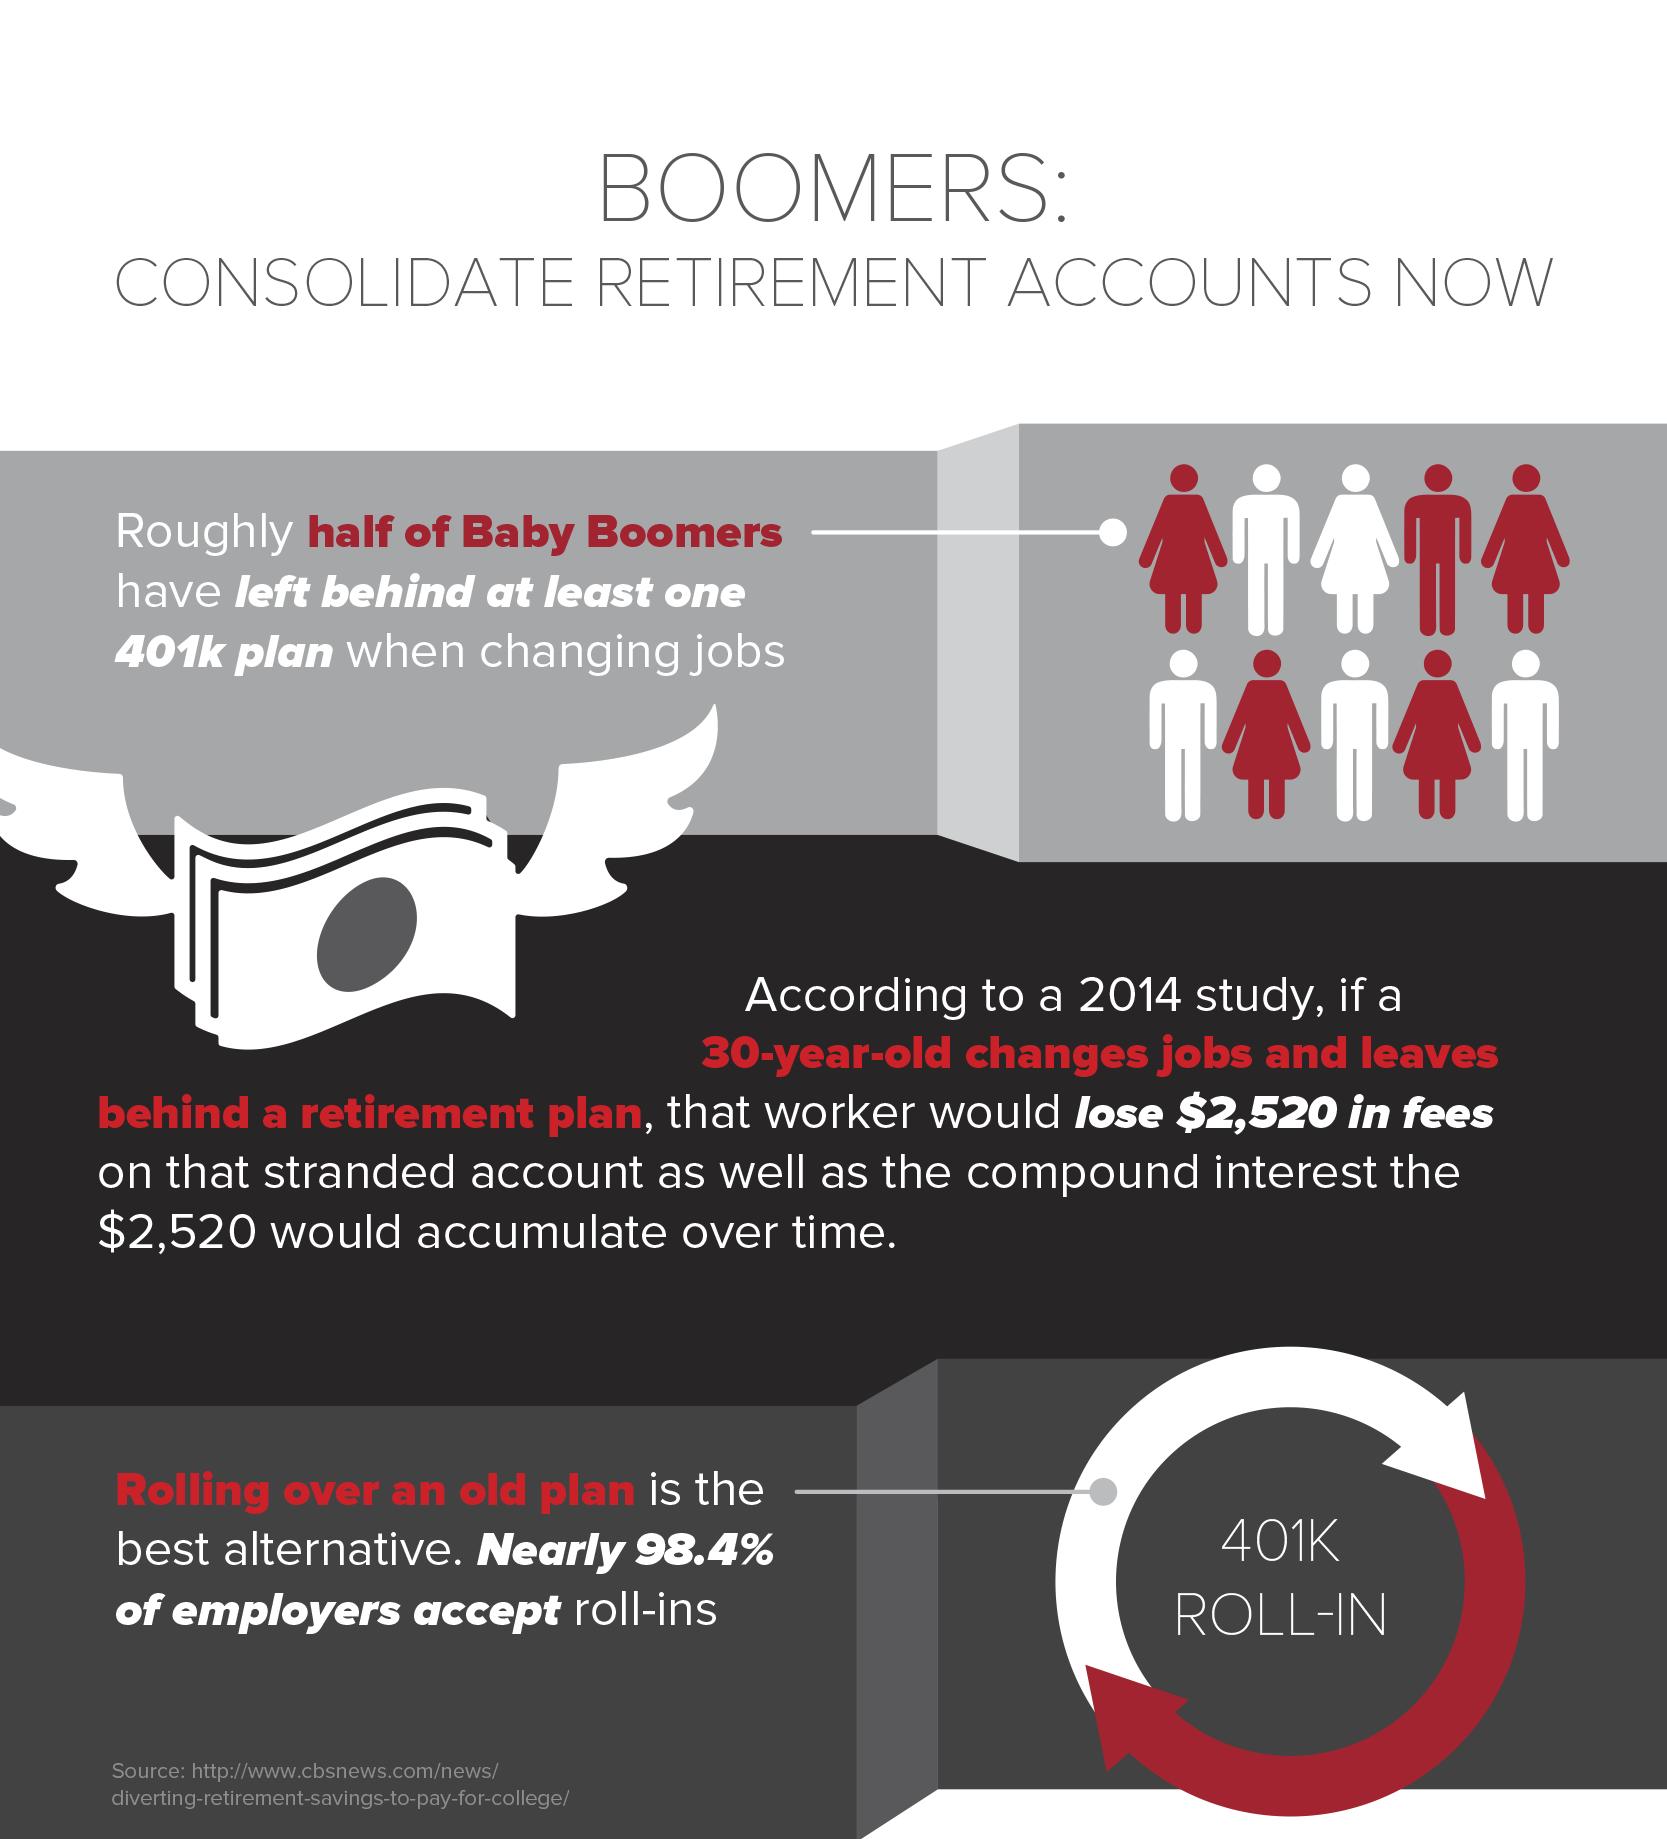 Fees consolidating 401k accounts